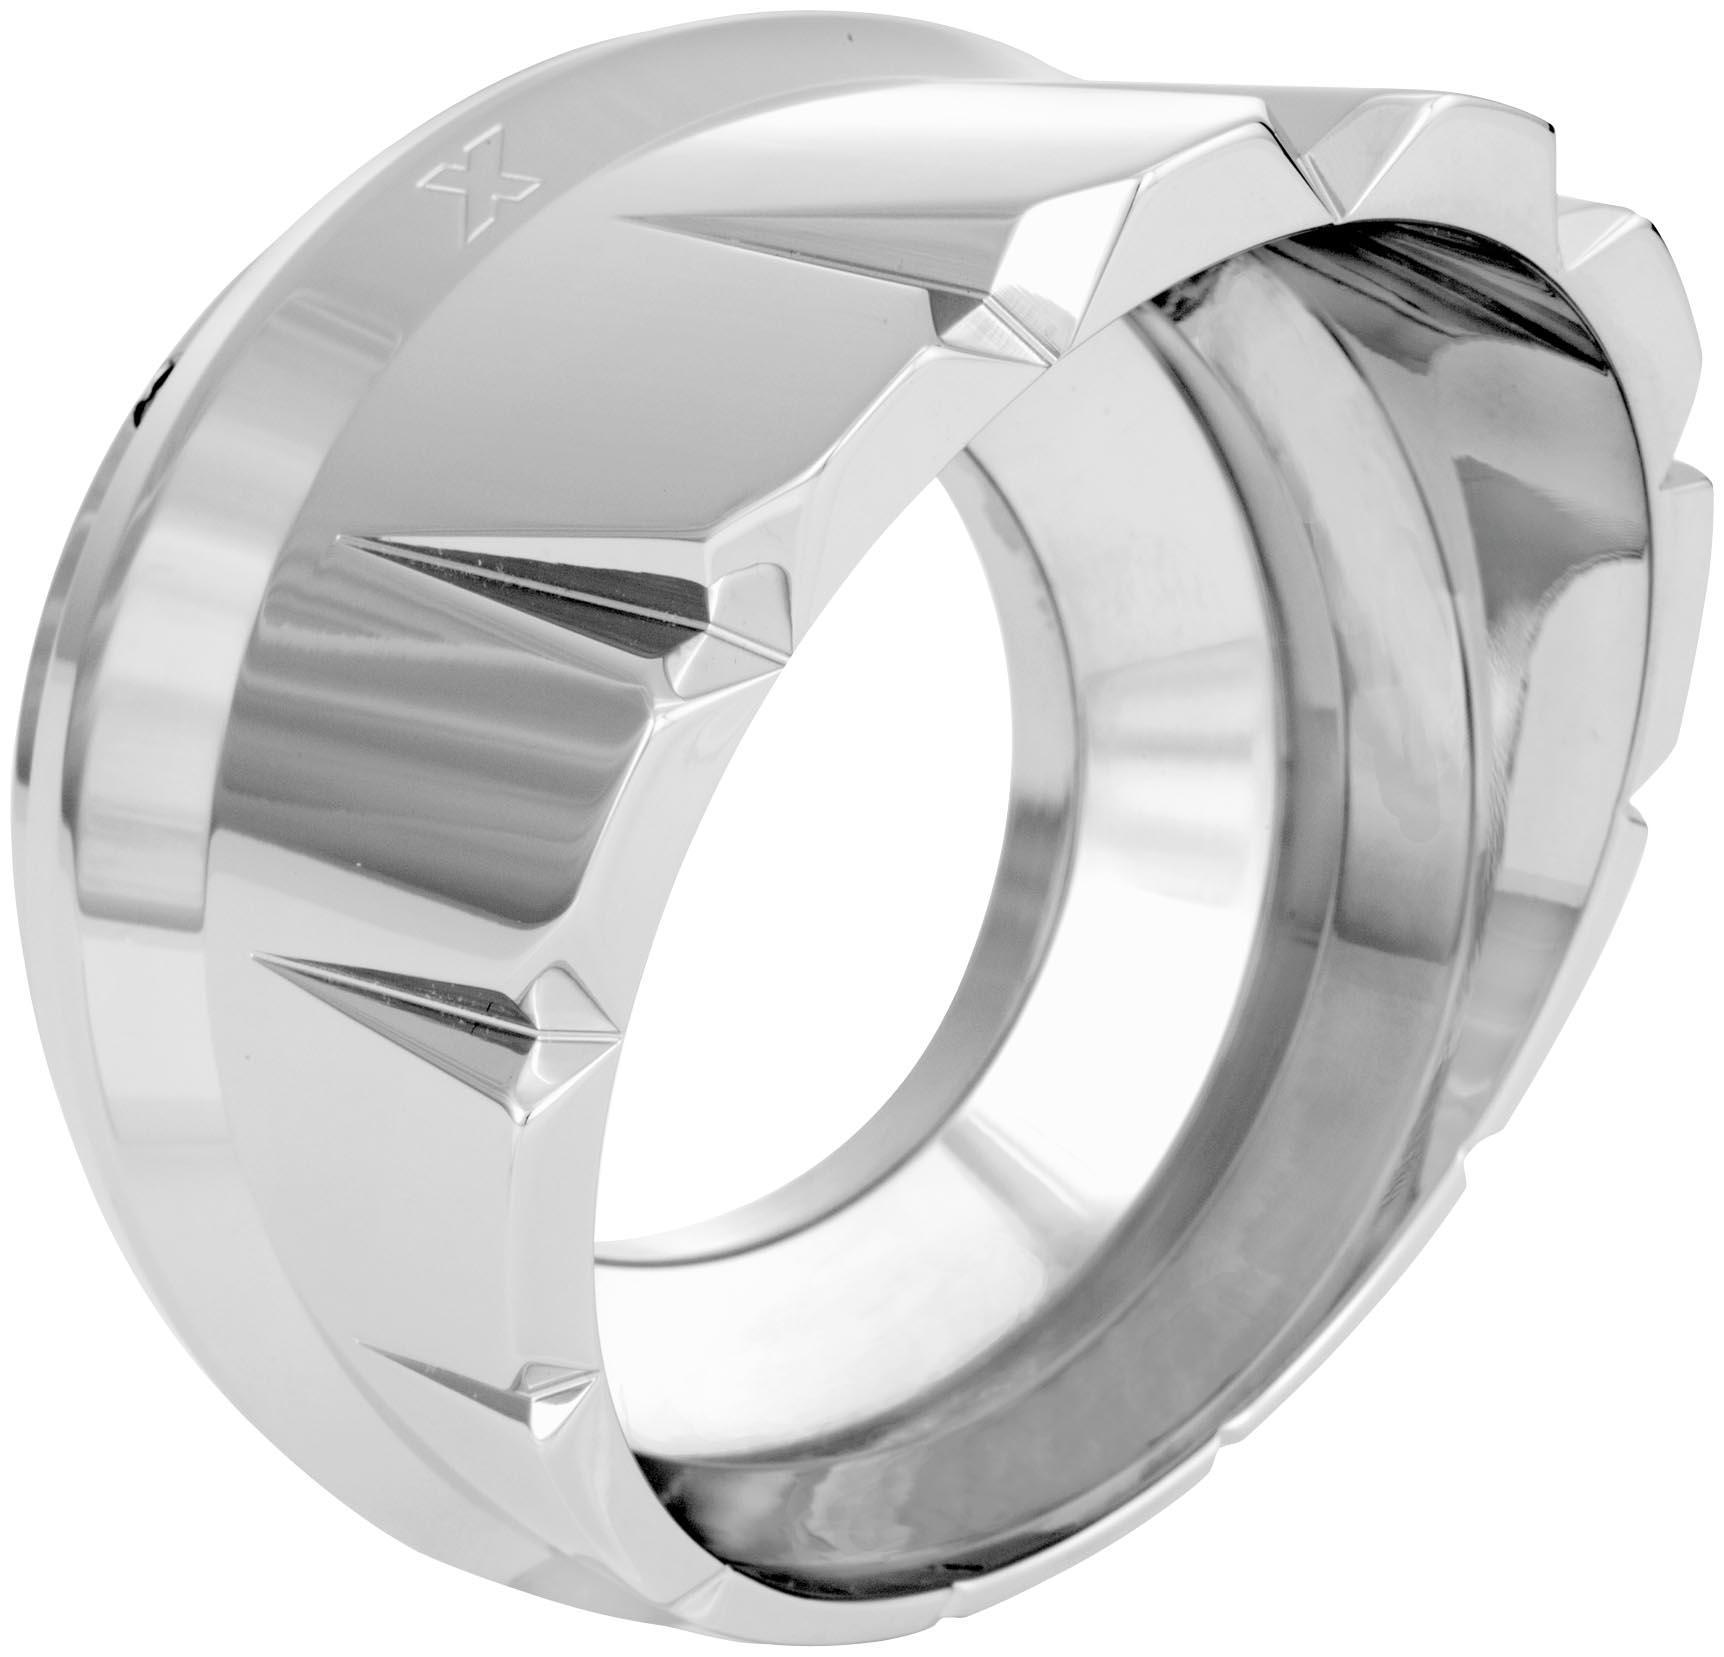 Xtreme Machine 0204-2020XVT-CH V-Cut Exhaust Tip